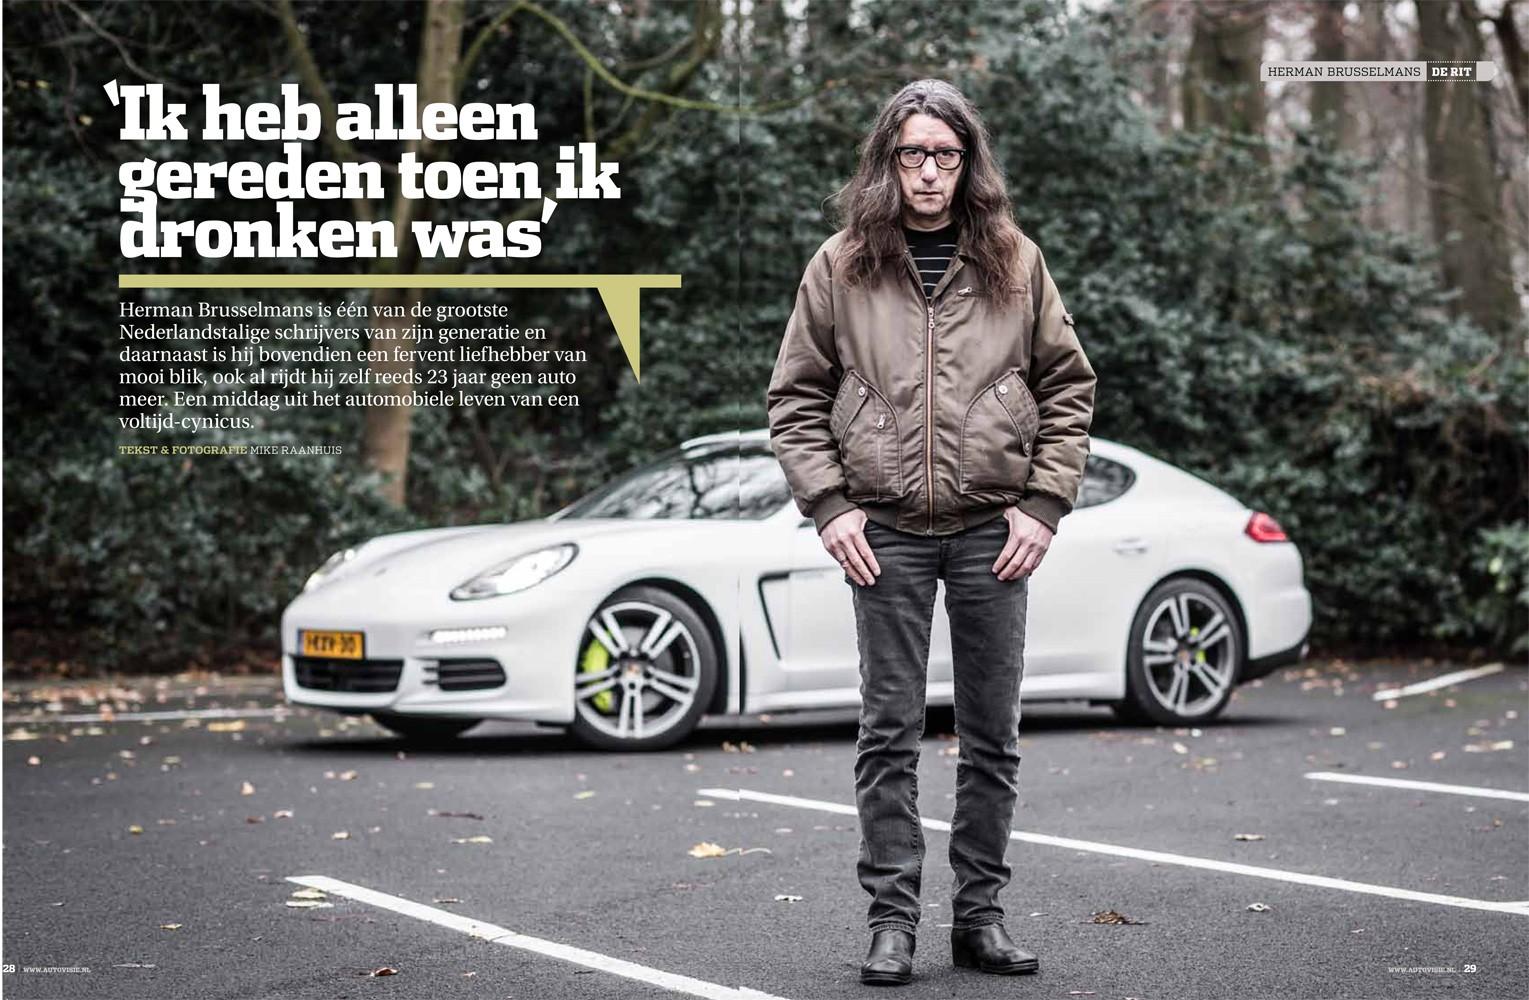 Brusselmans vs Porsche